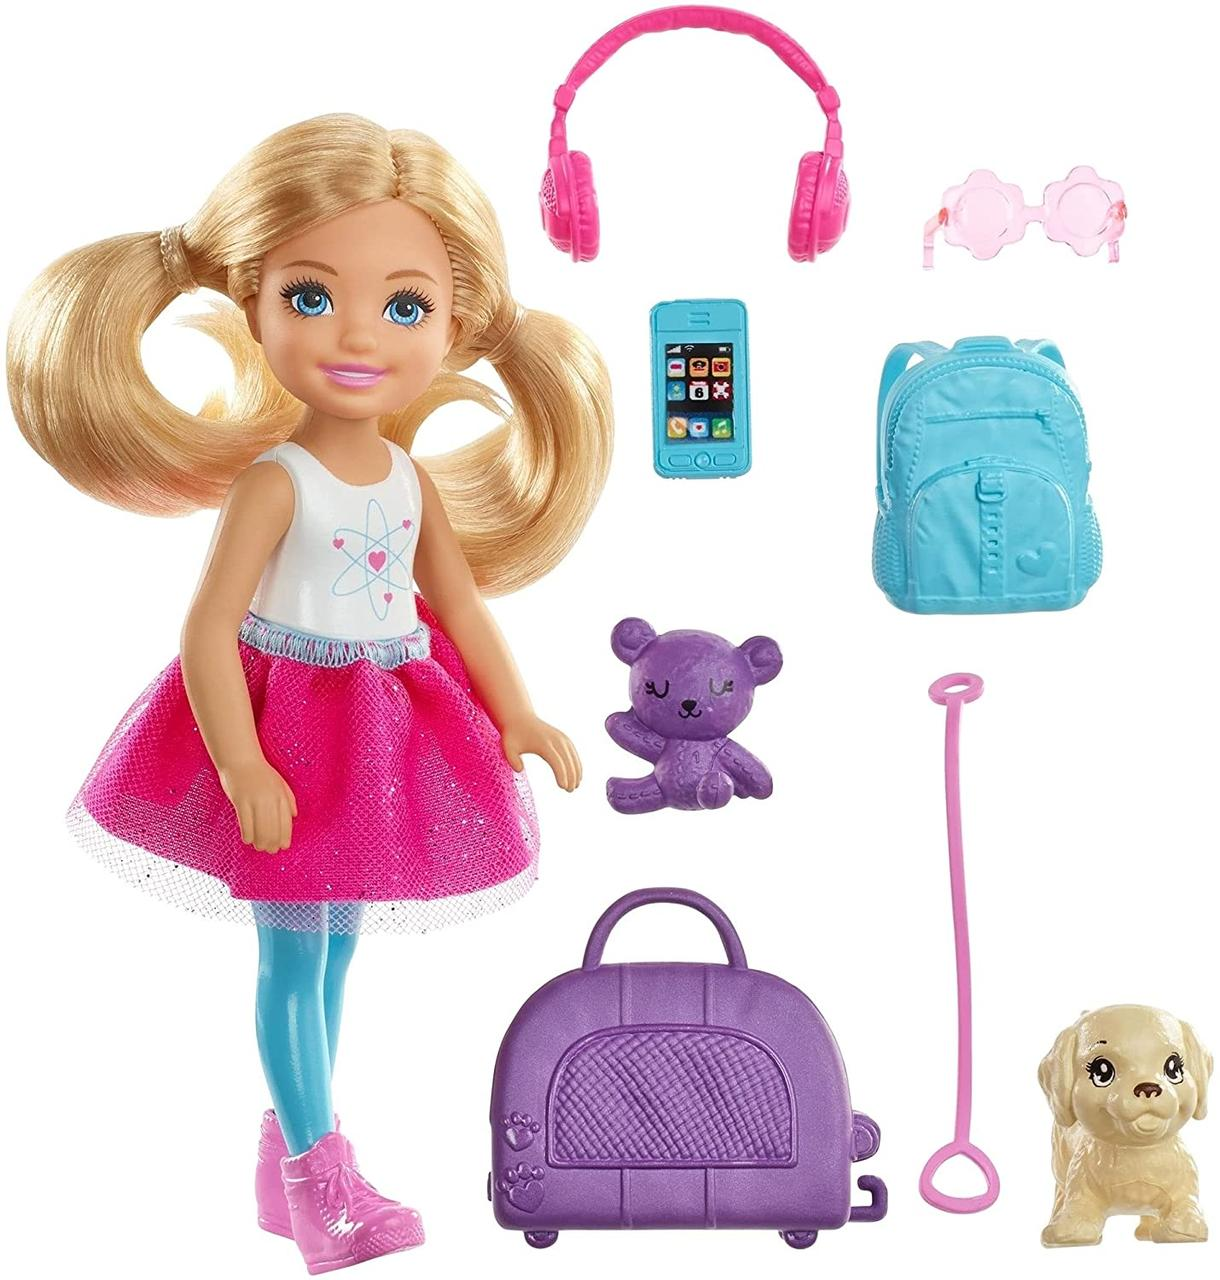 Кукла Барби Челси Путешественница